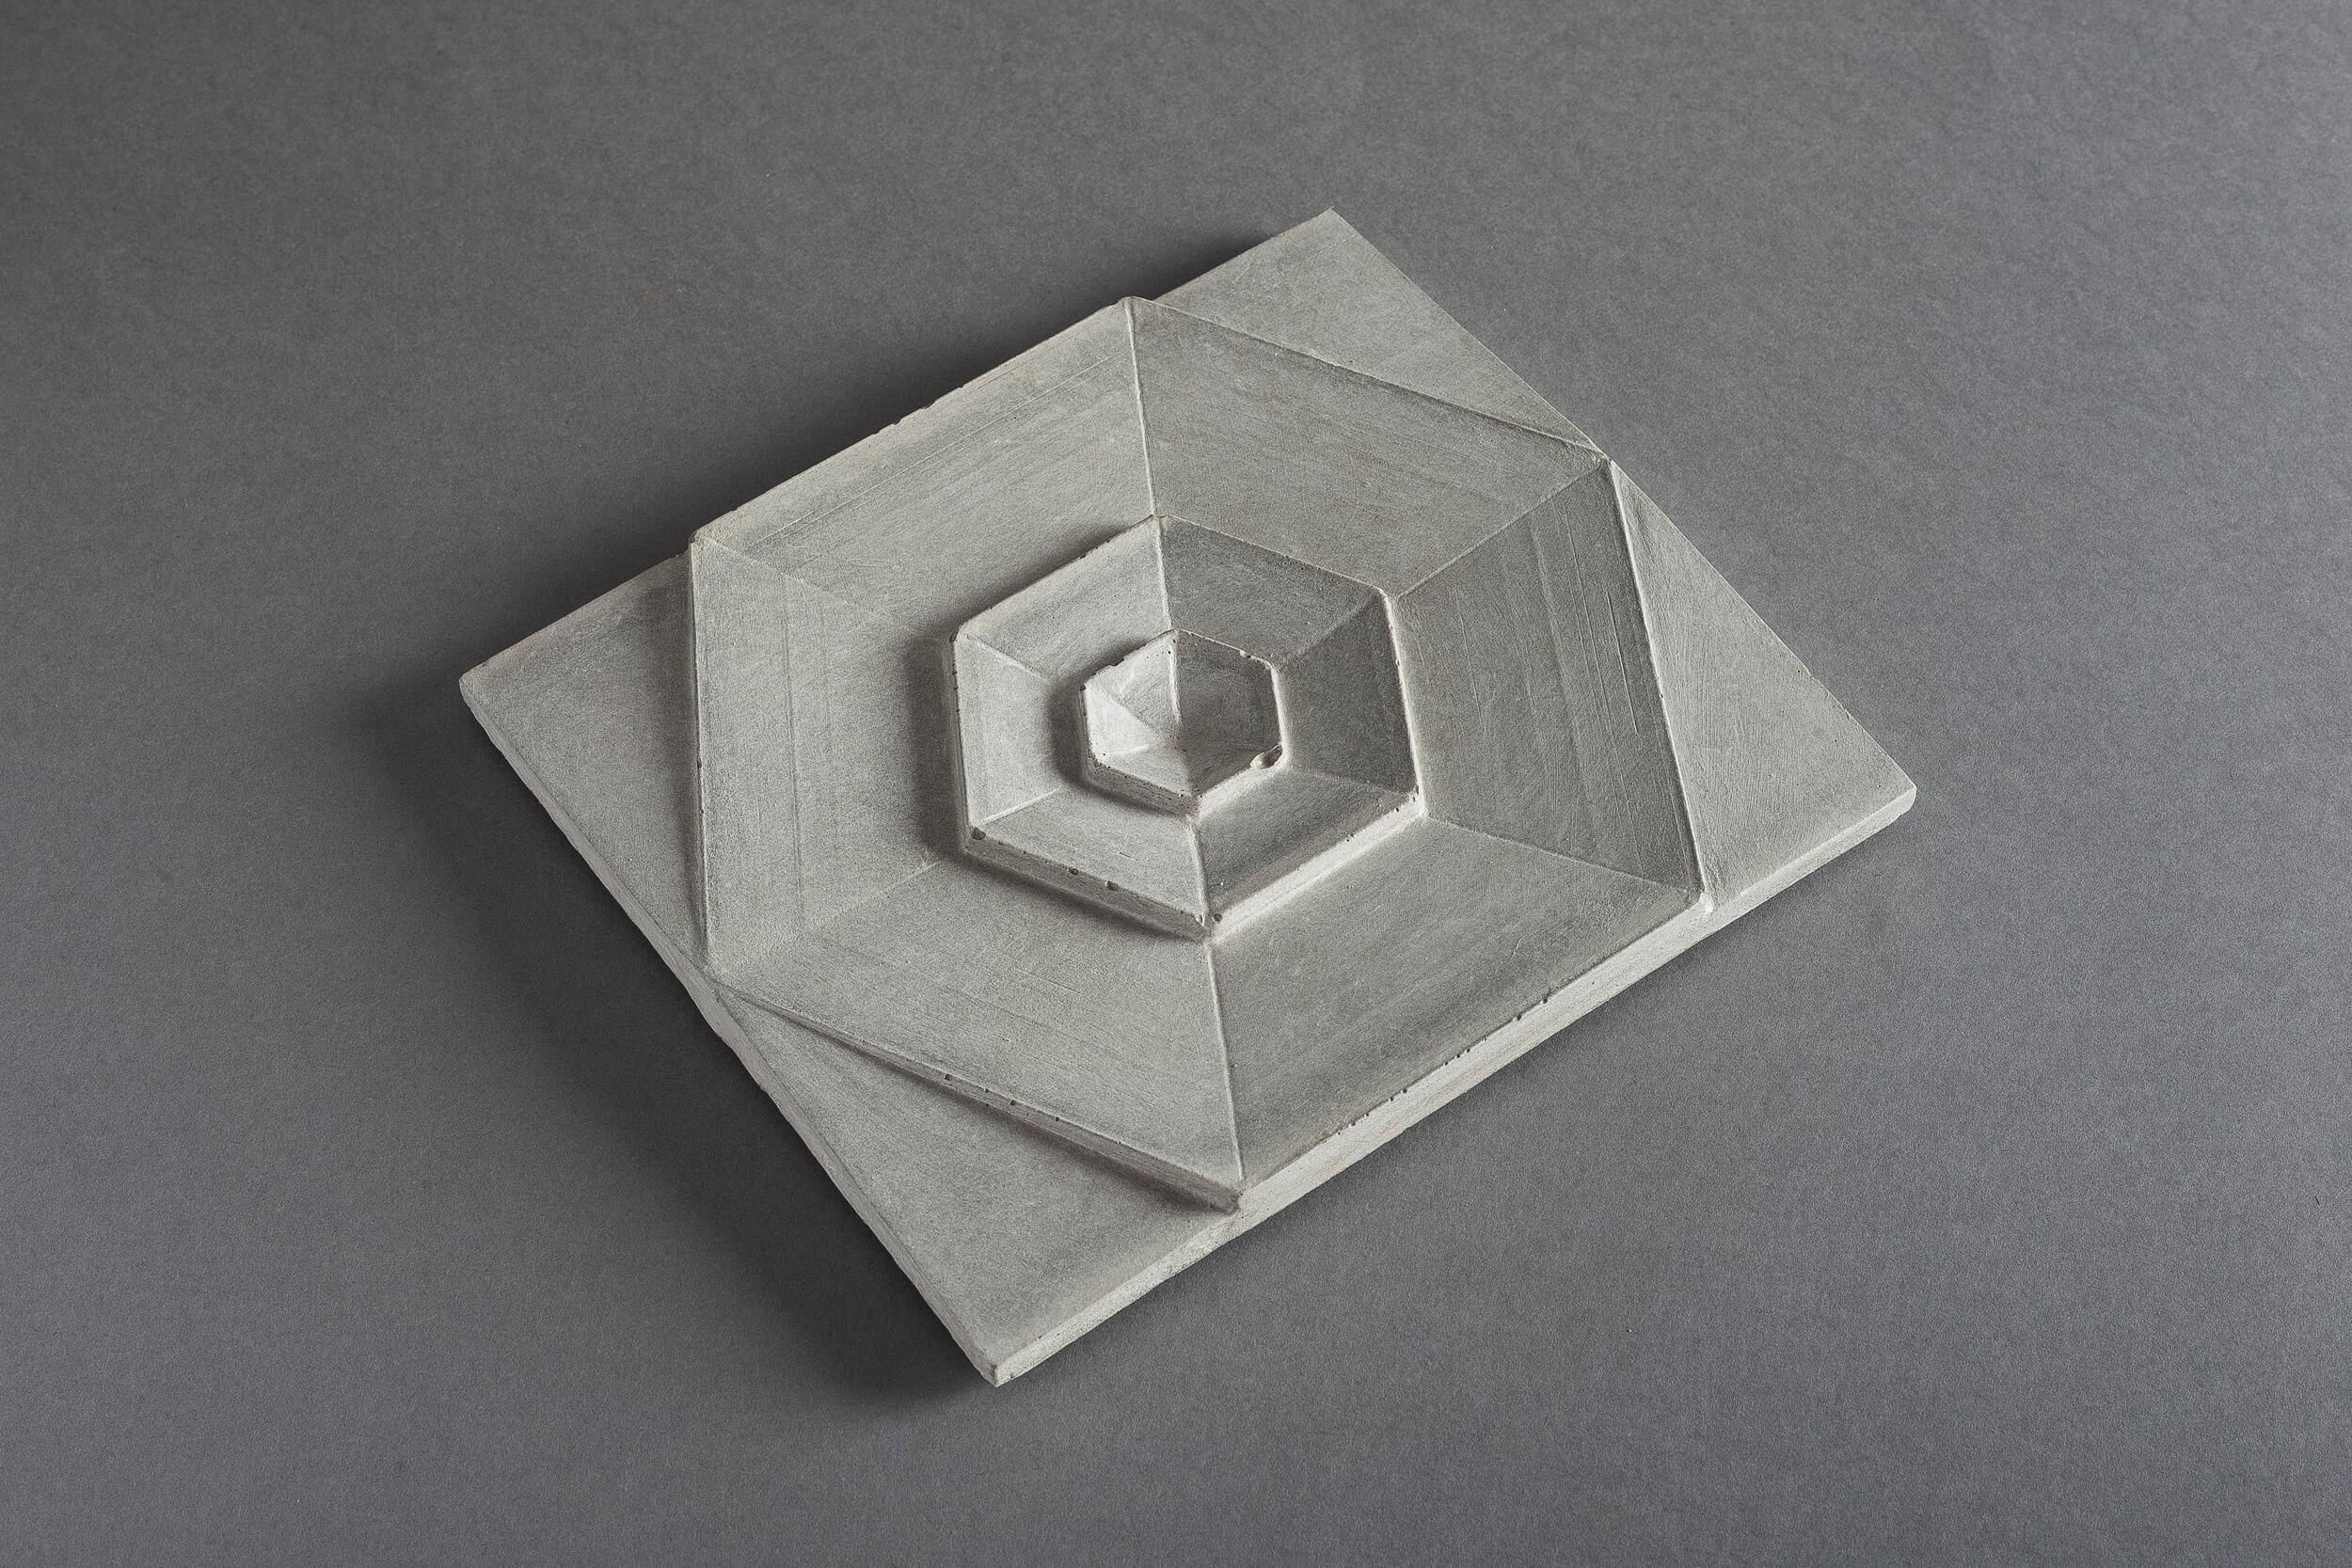 Plaster_studio_tile_07_concrete